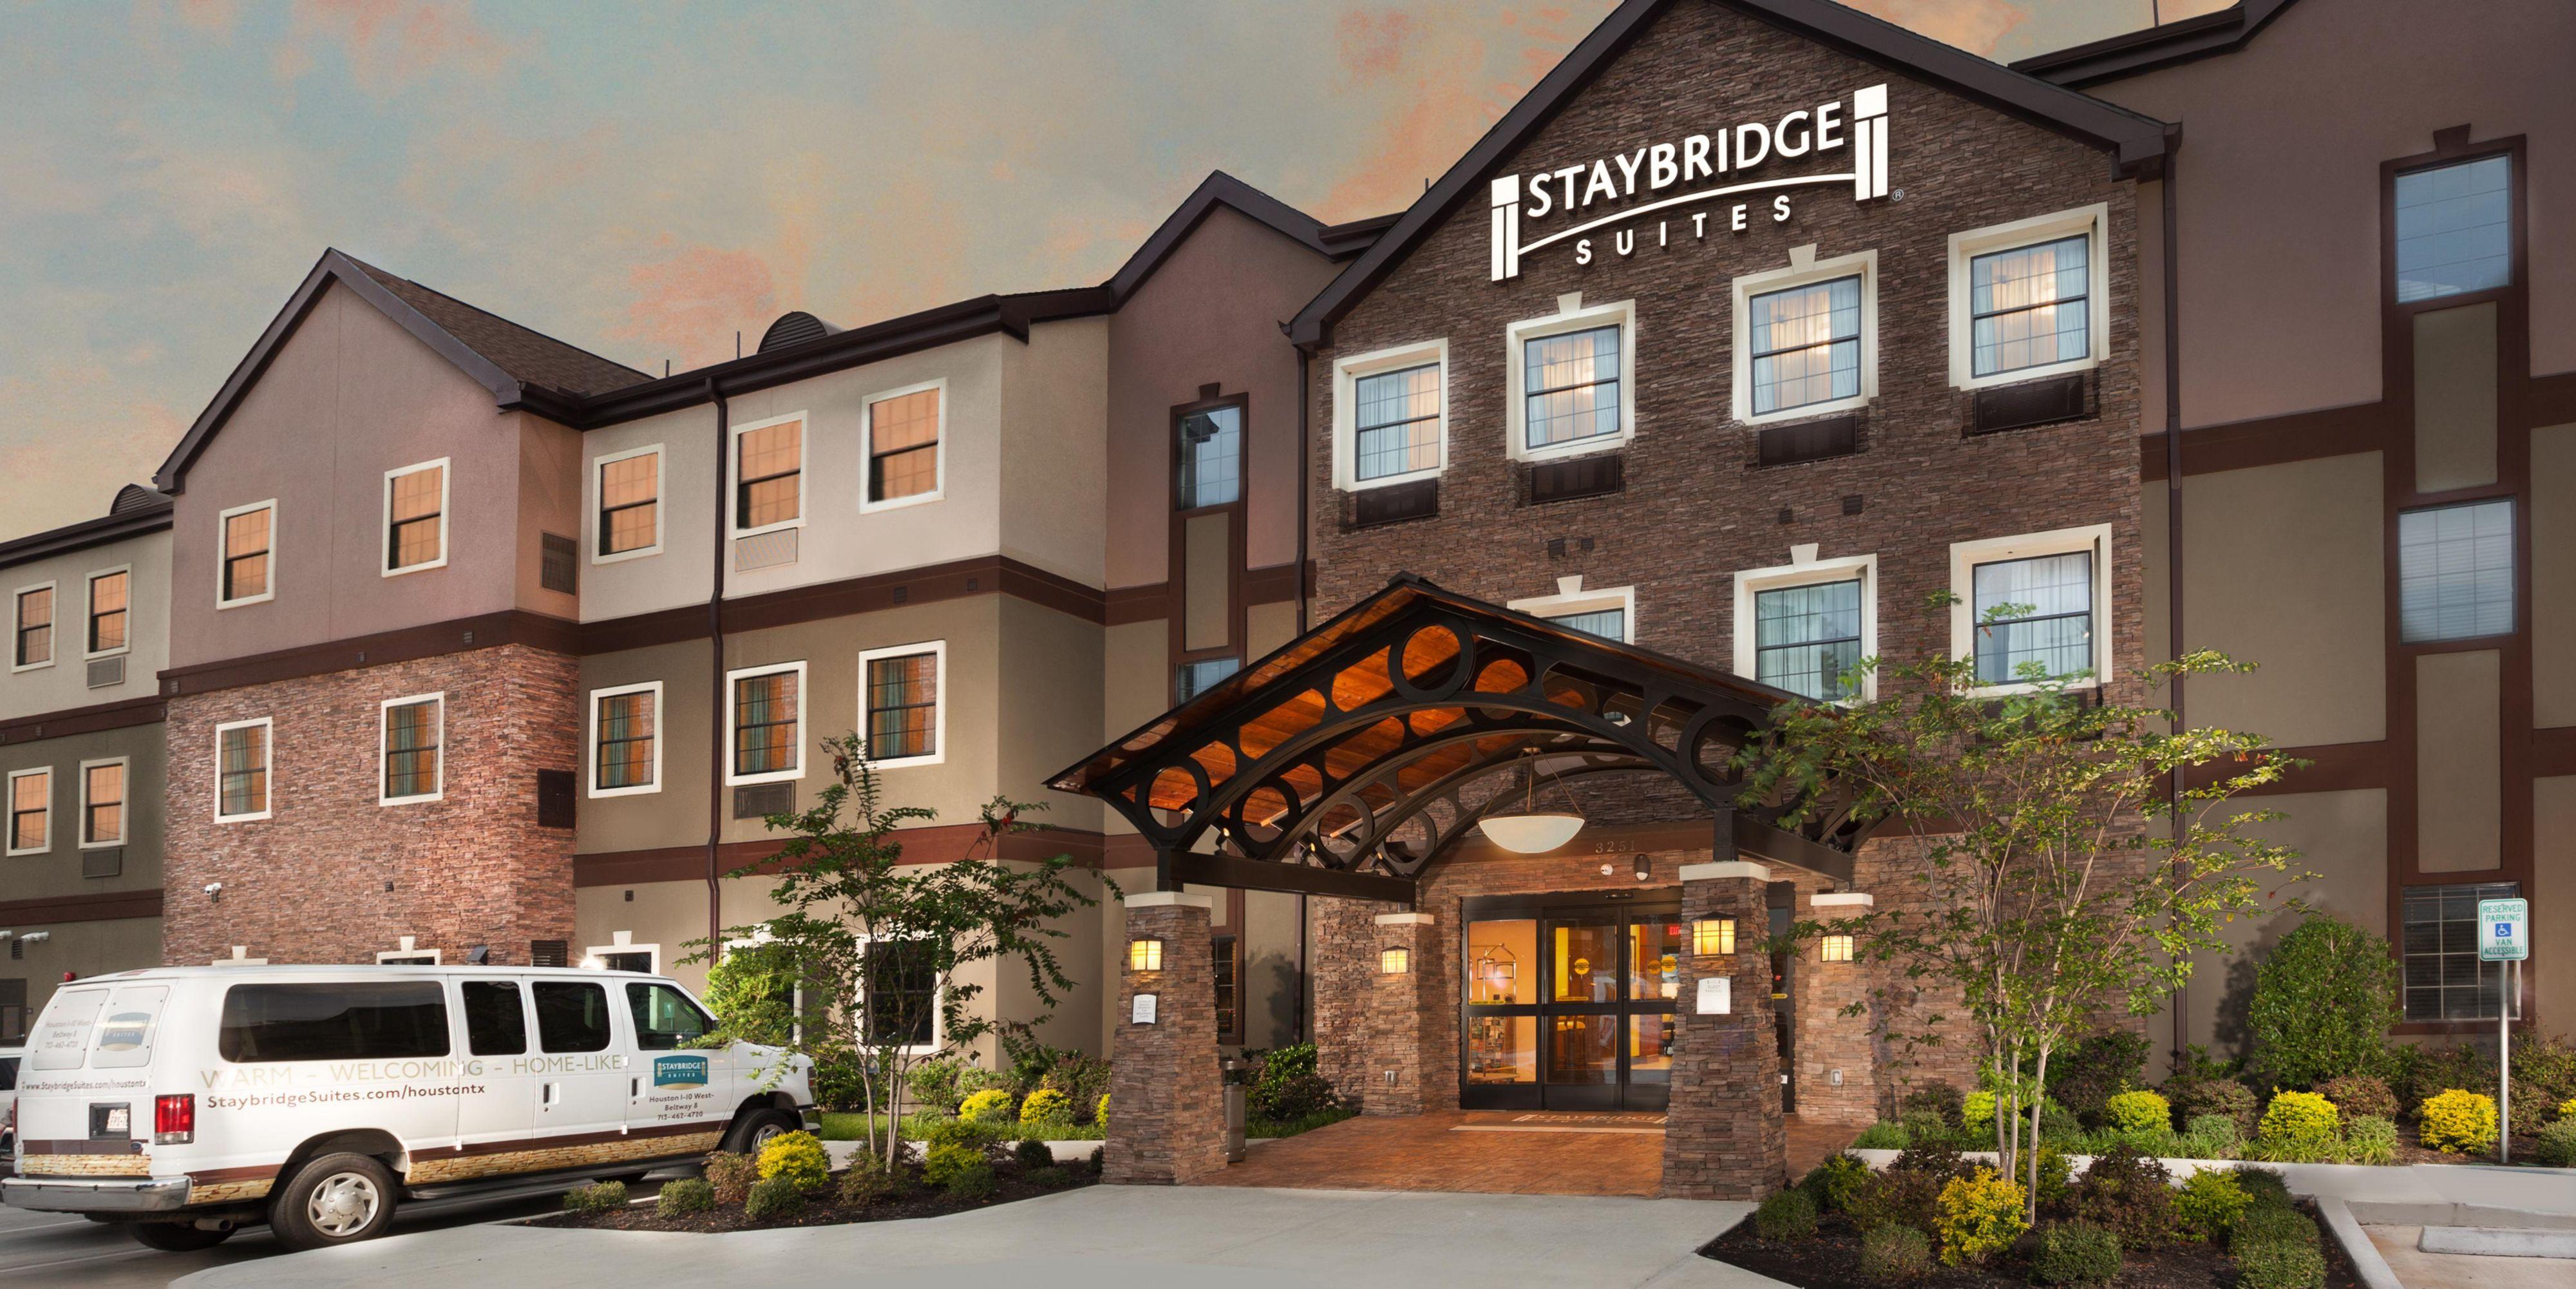 Hotel Exterior Welcome To Staybridge Suites Houston I 10 W Bwy 8